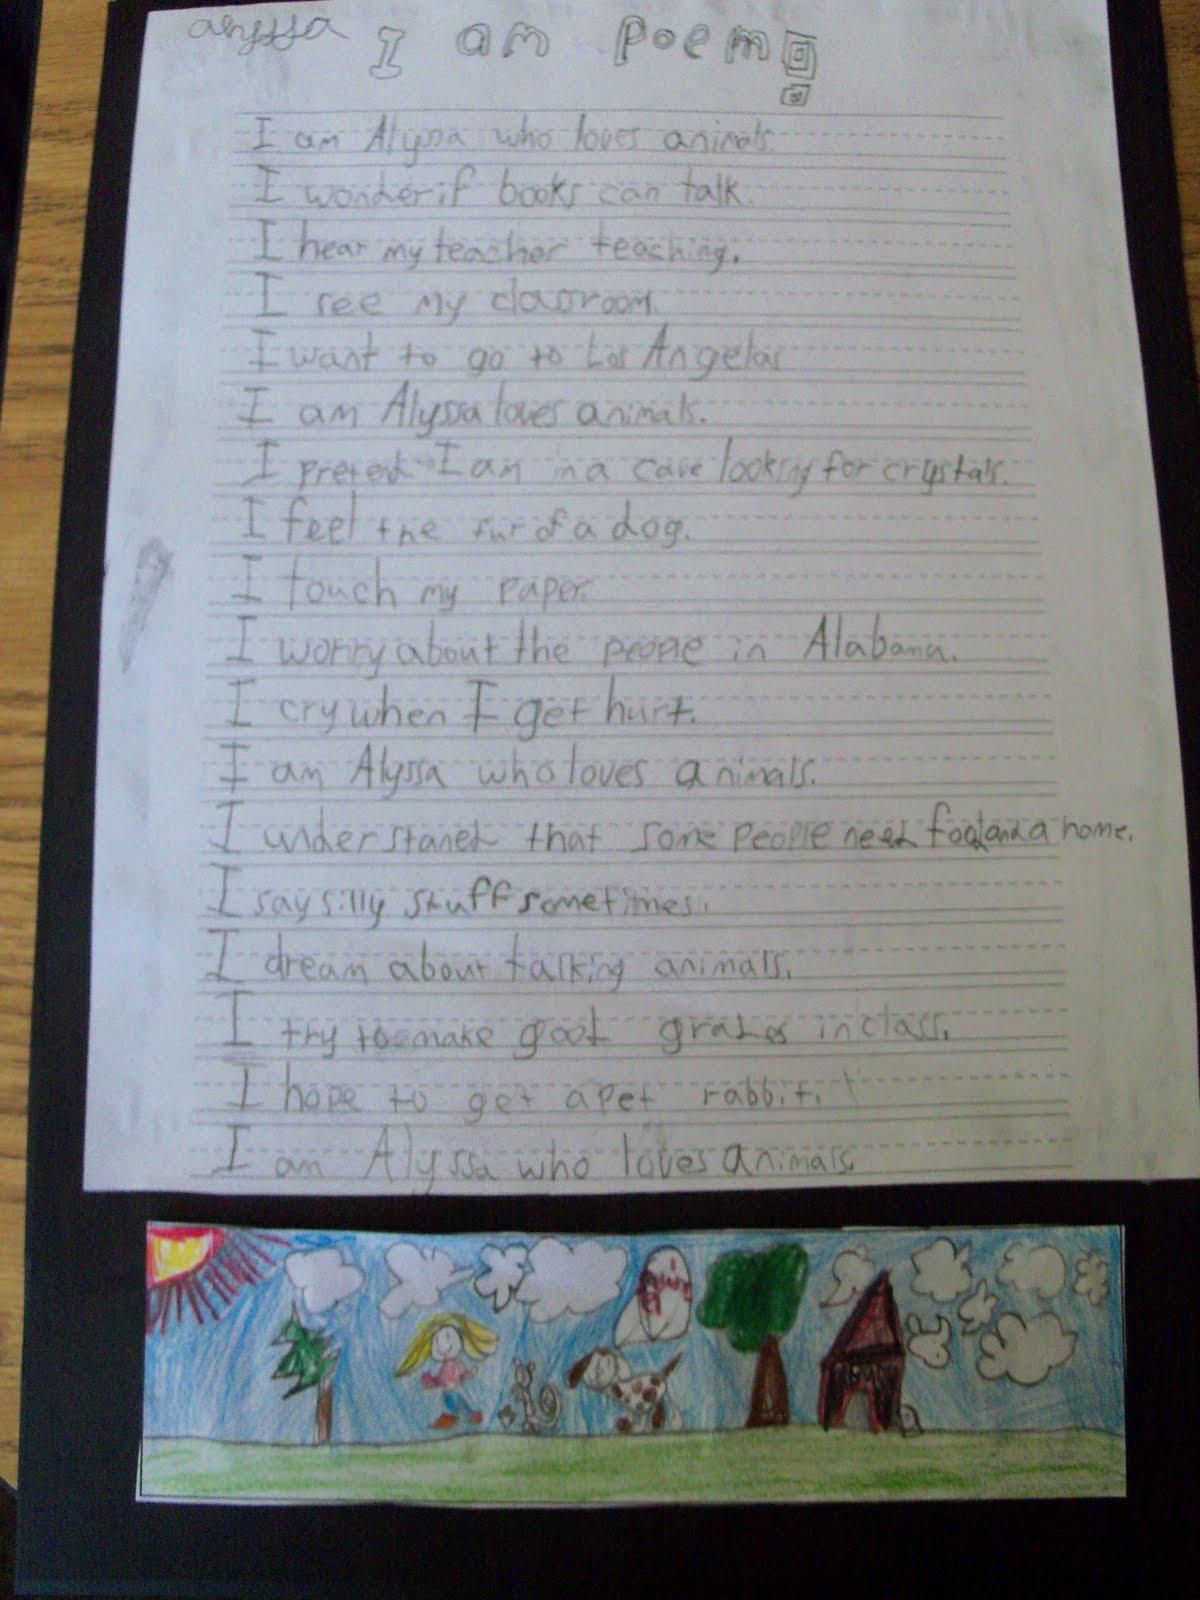 Third Gr De Me Nder Gs I M Poem